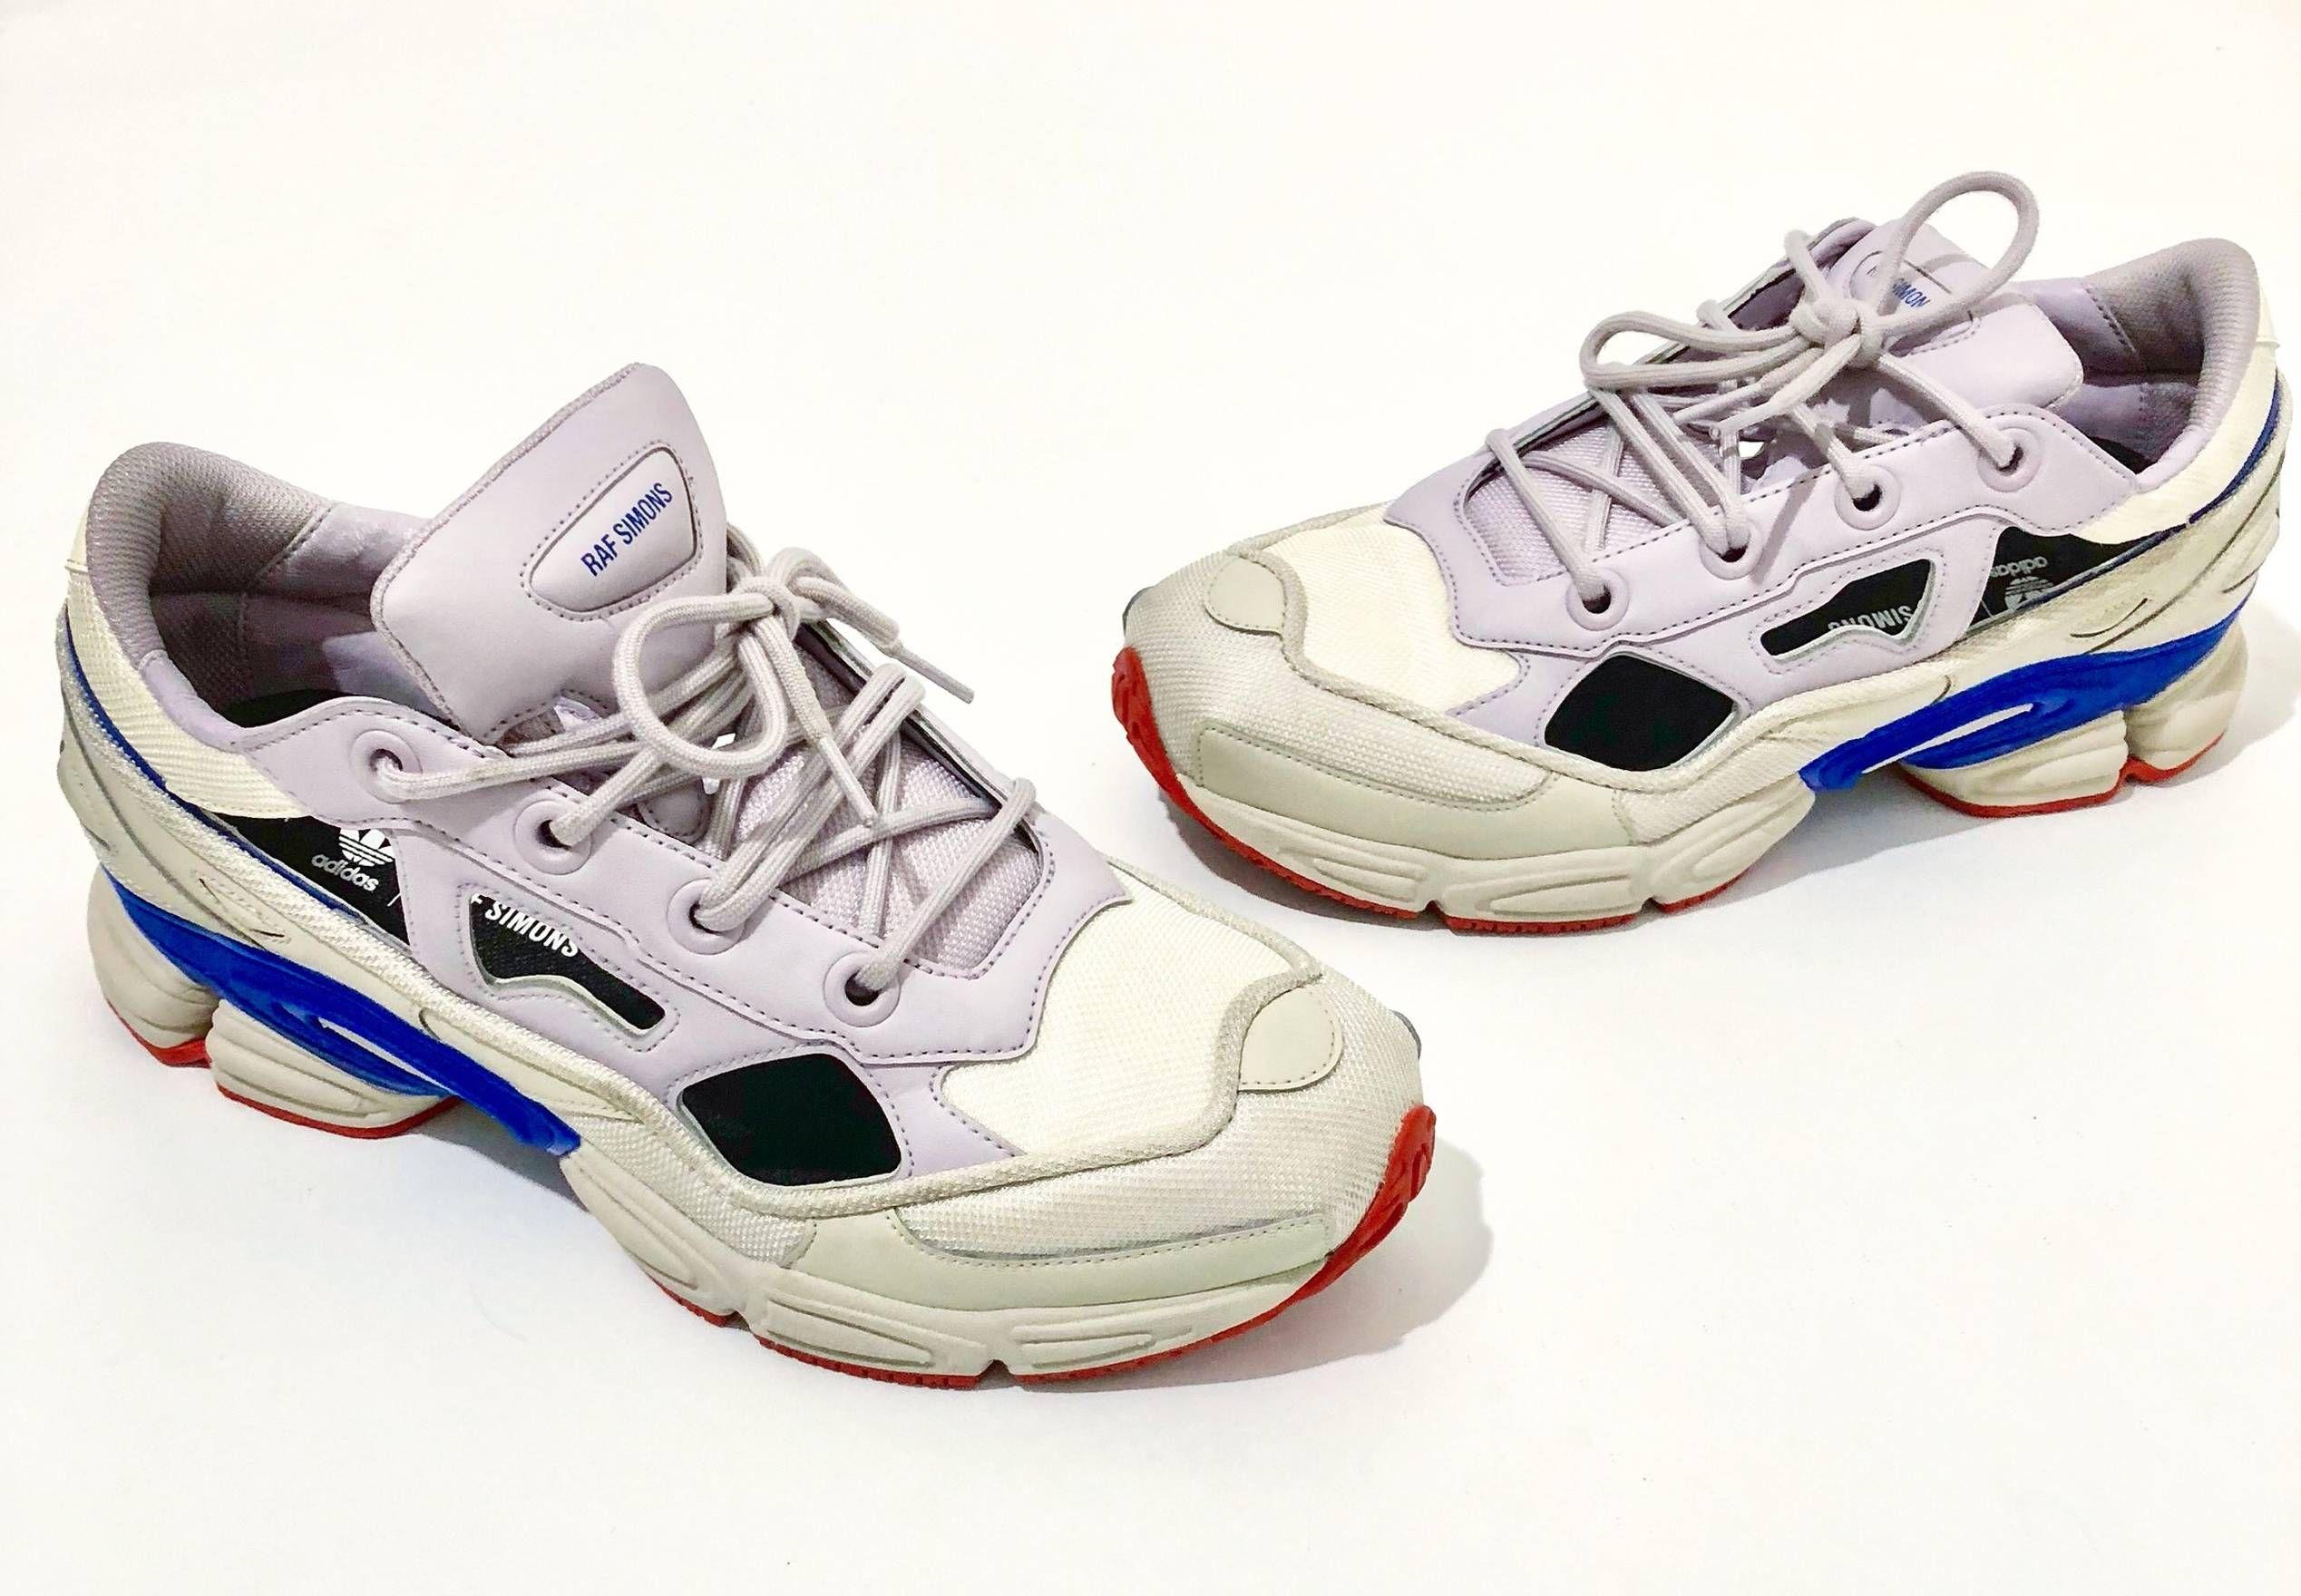 adidas Dragon Ball Z Vegate Ultra Tech Multicolor Fashion Sneaker D97054 Size 10